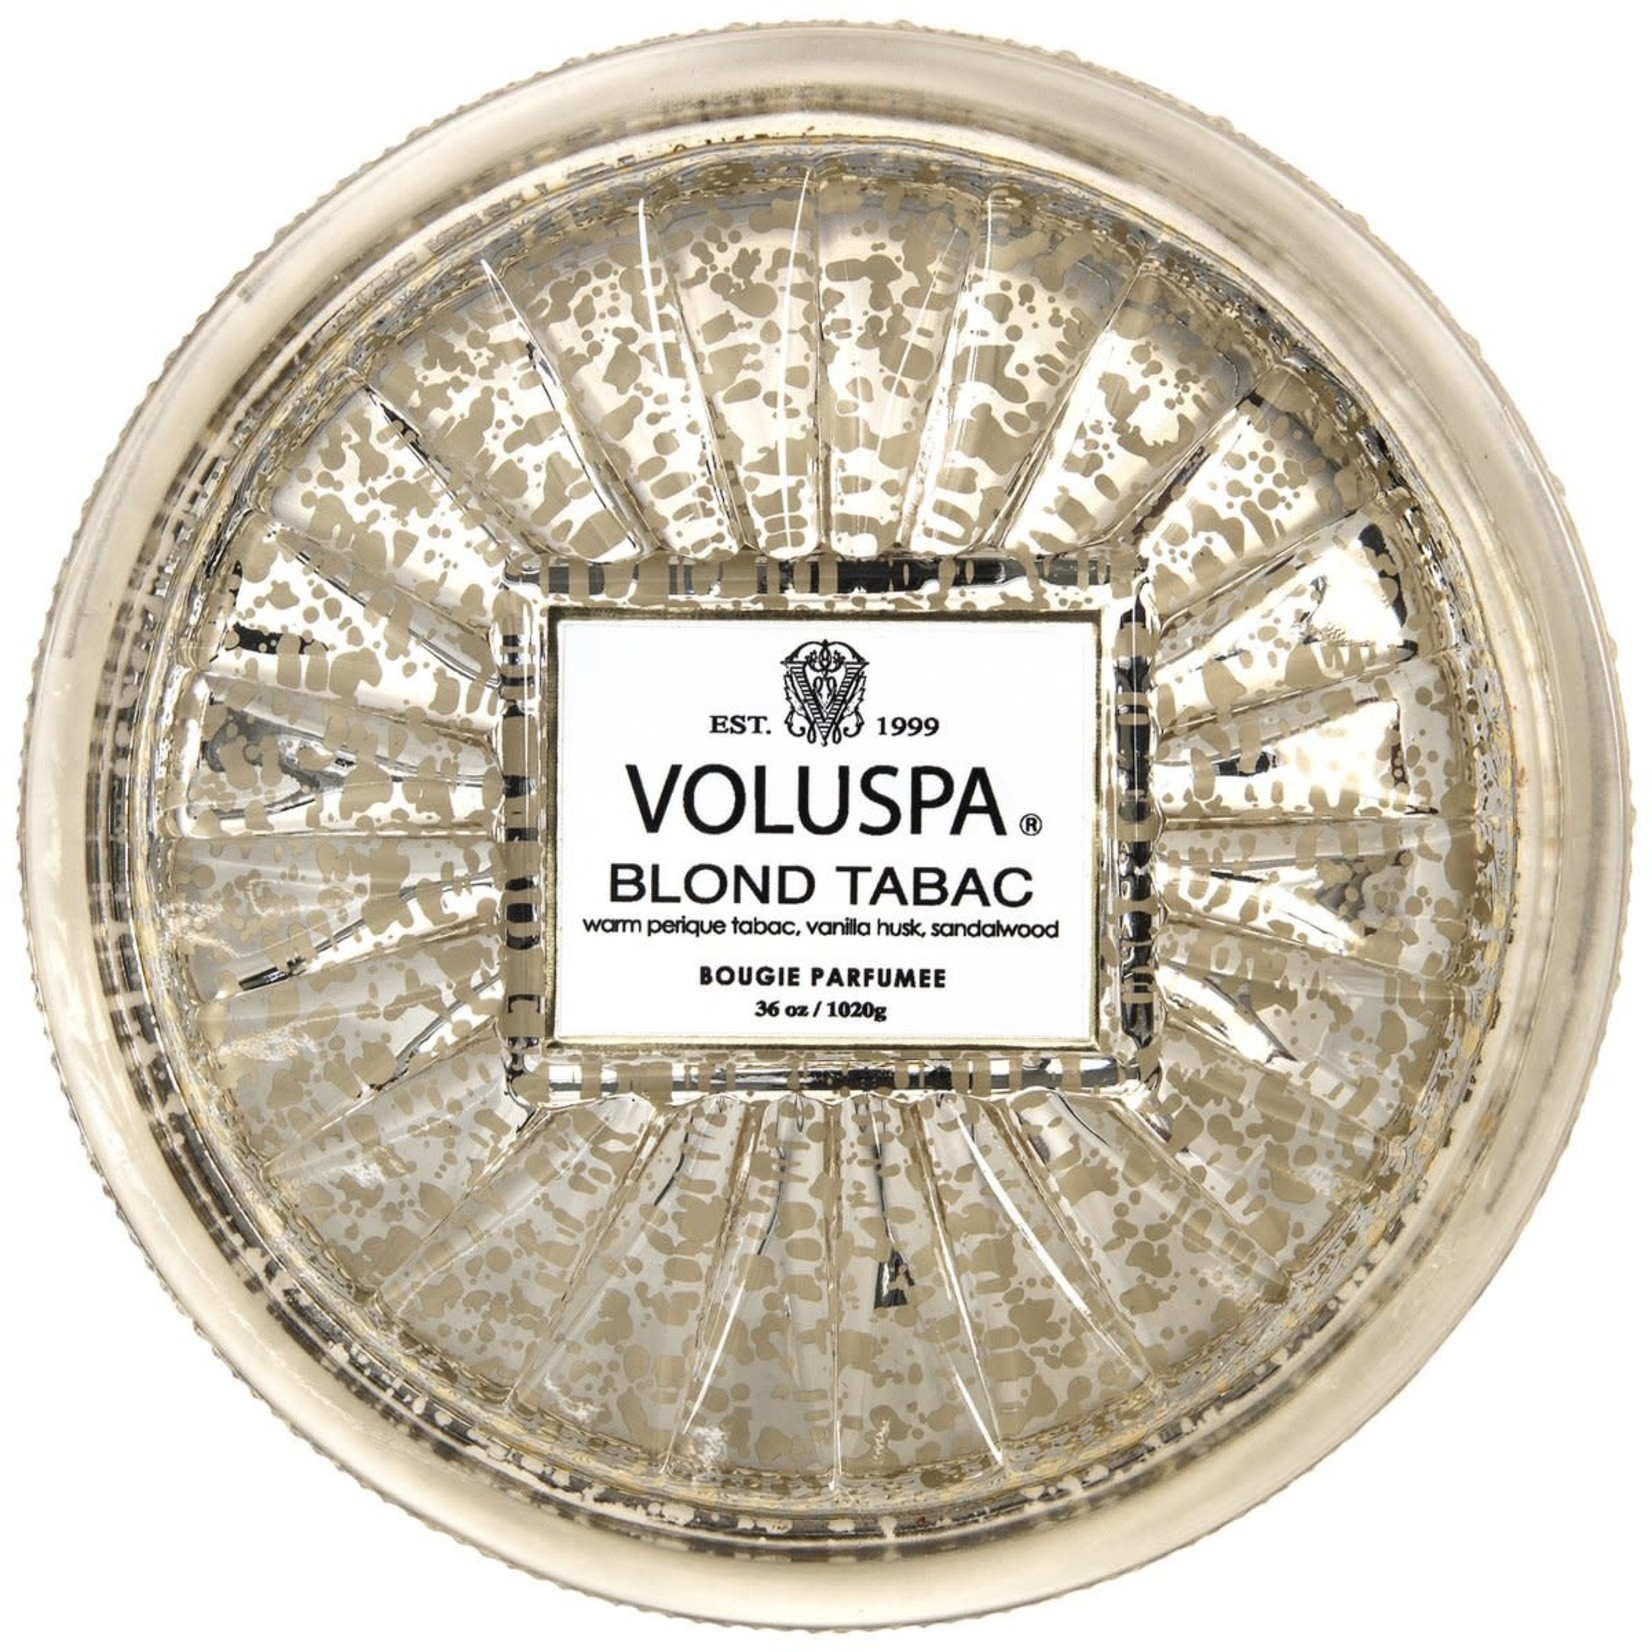 Voluspa Blond Tabac Grande Maison Candle